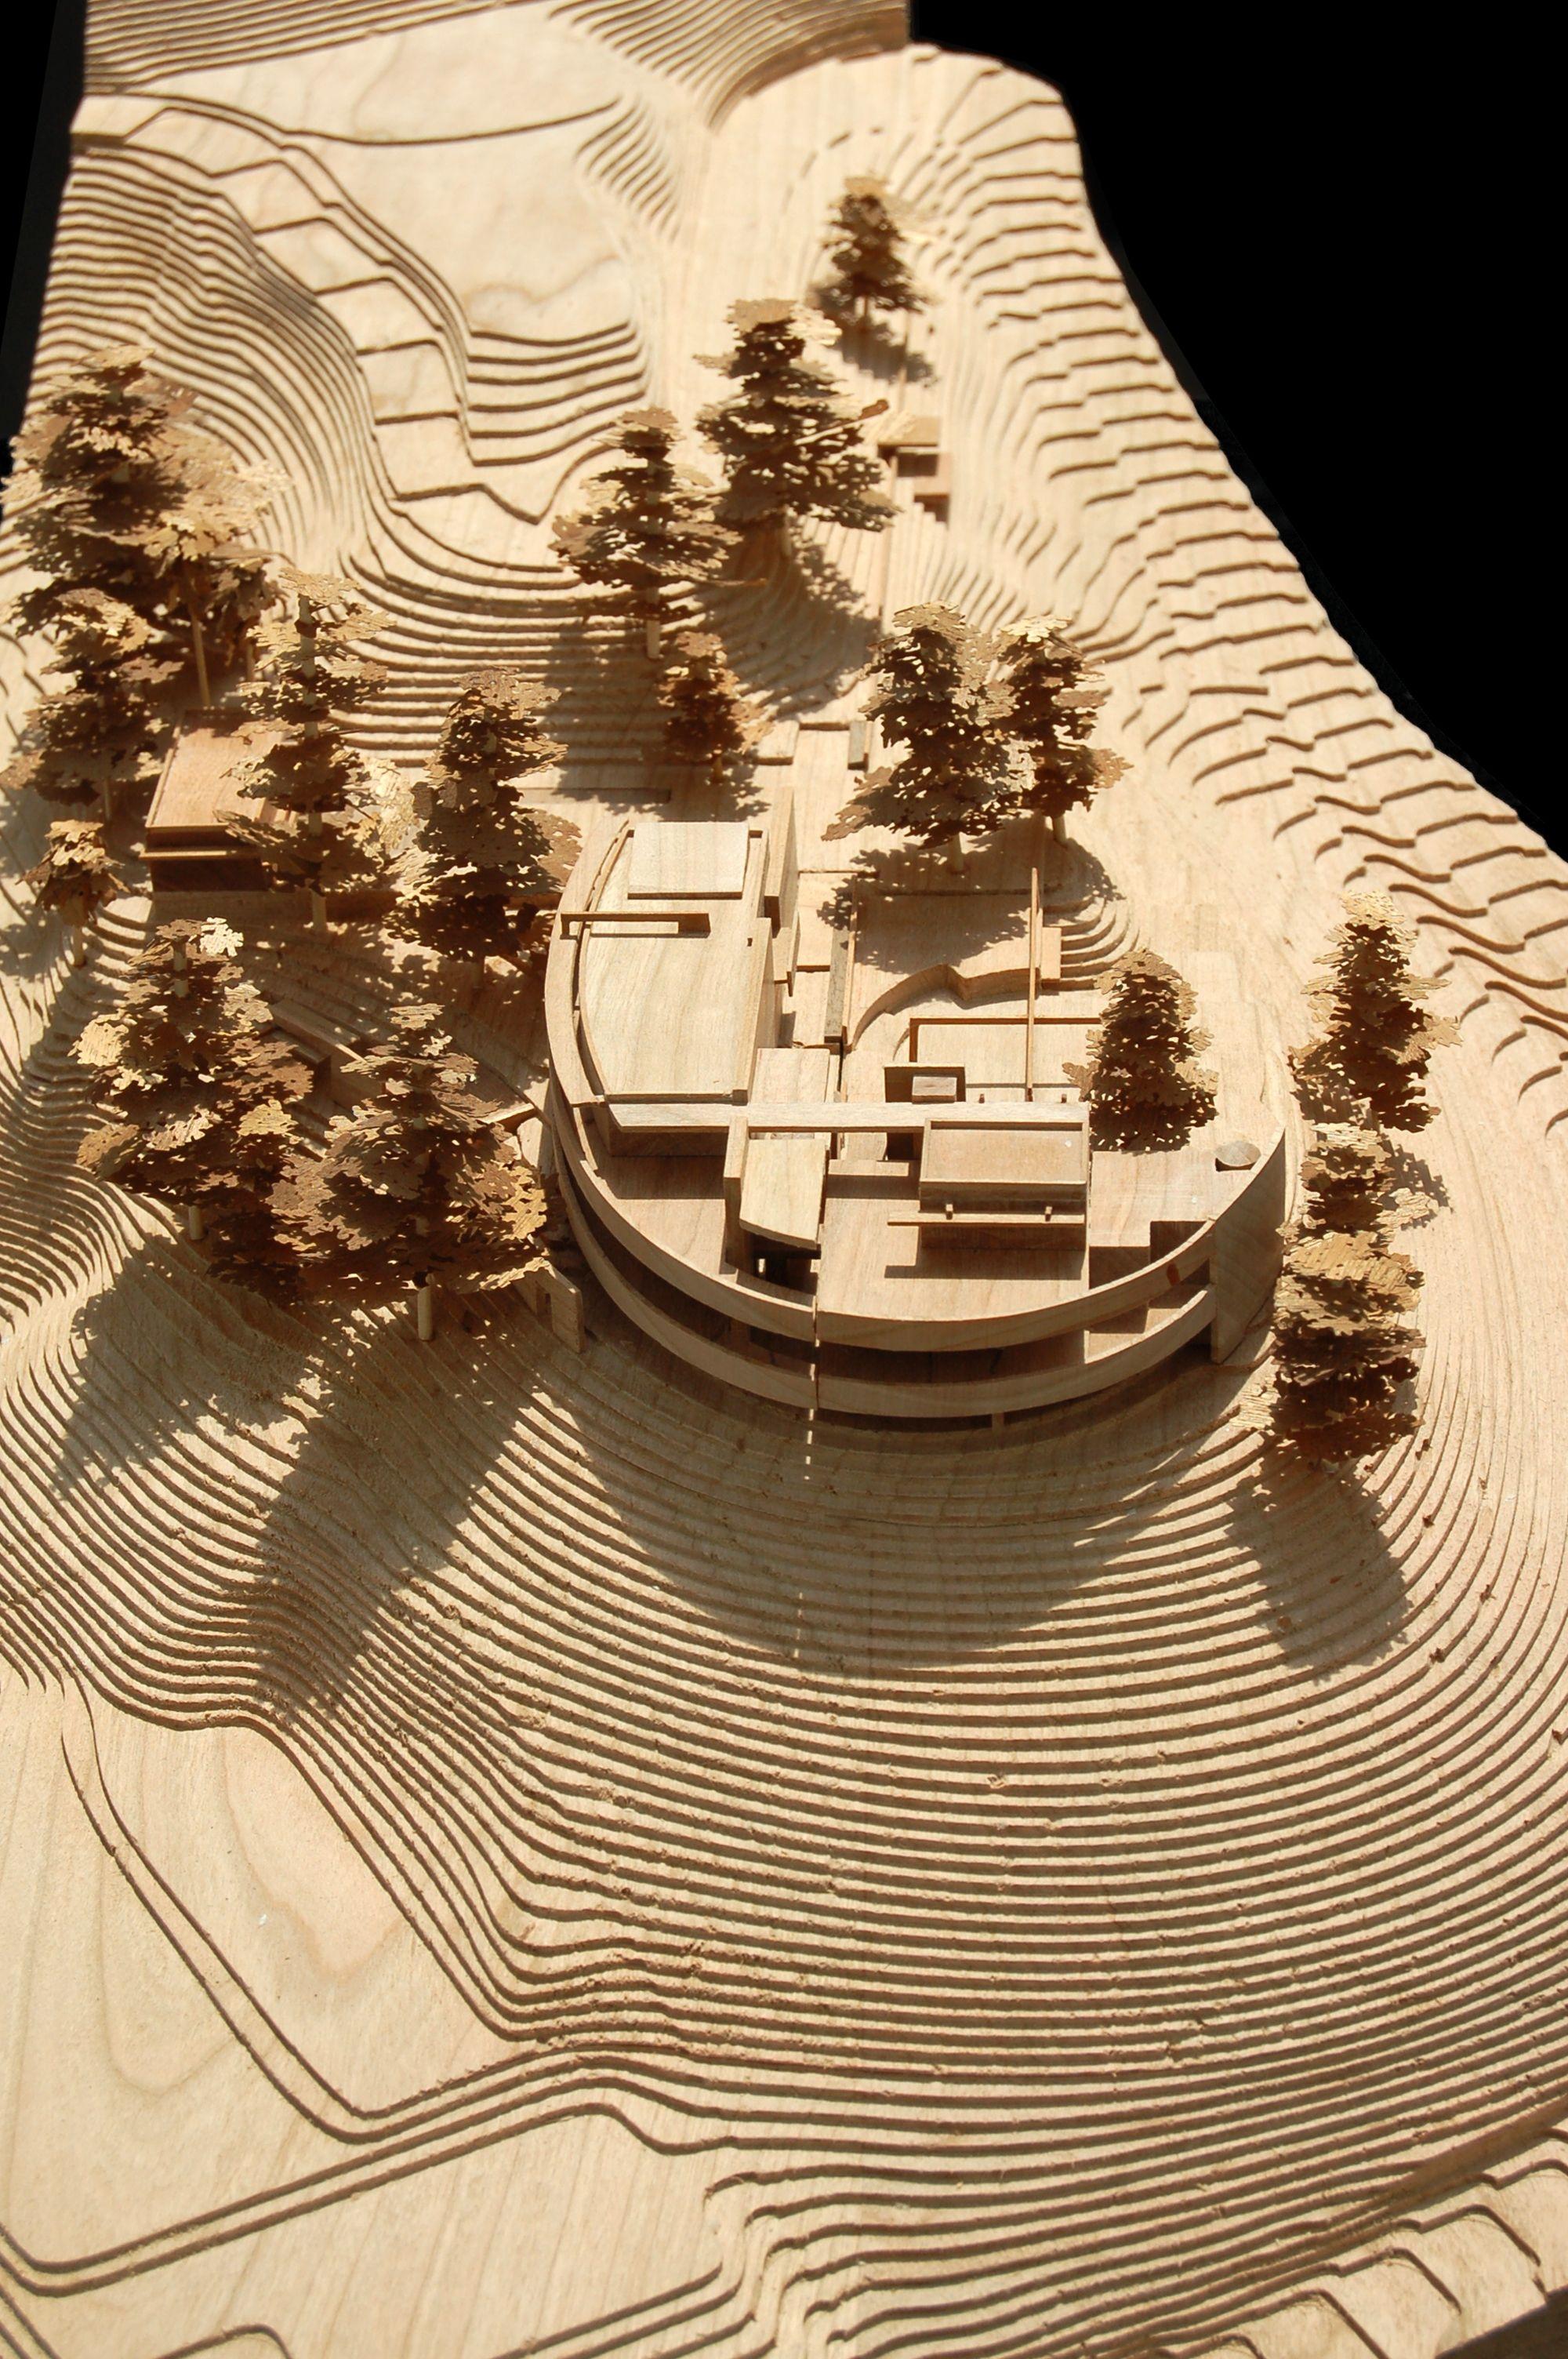 Laser Cut Architecture Model Tom De Marrom Interessante